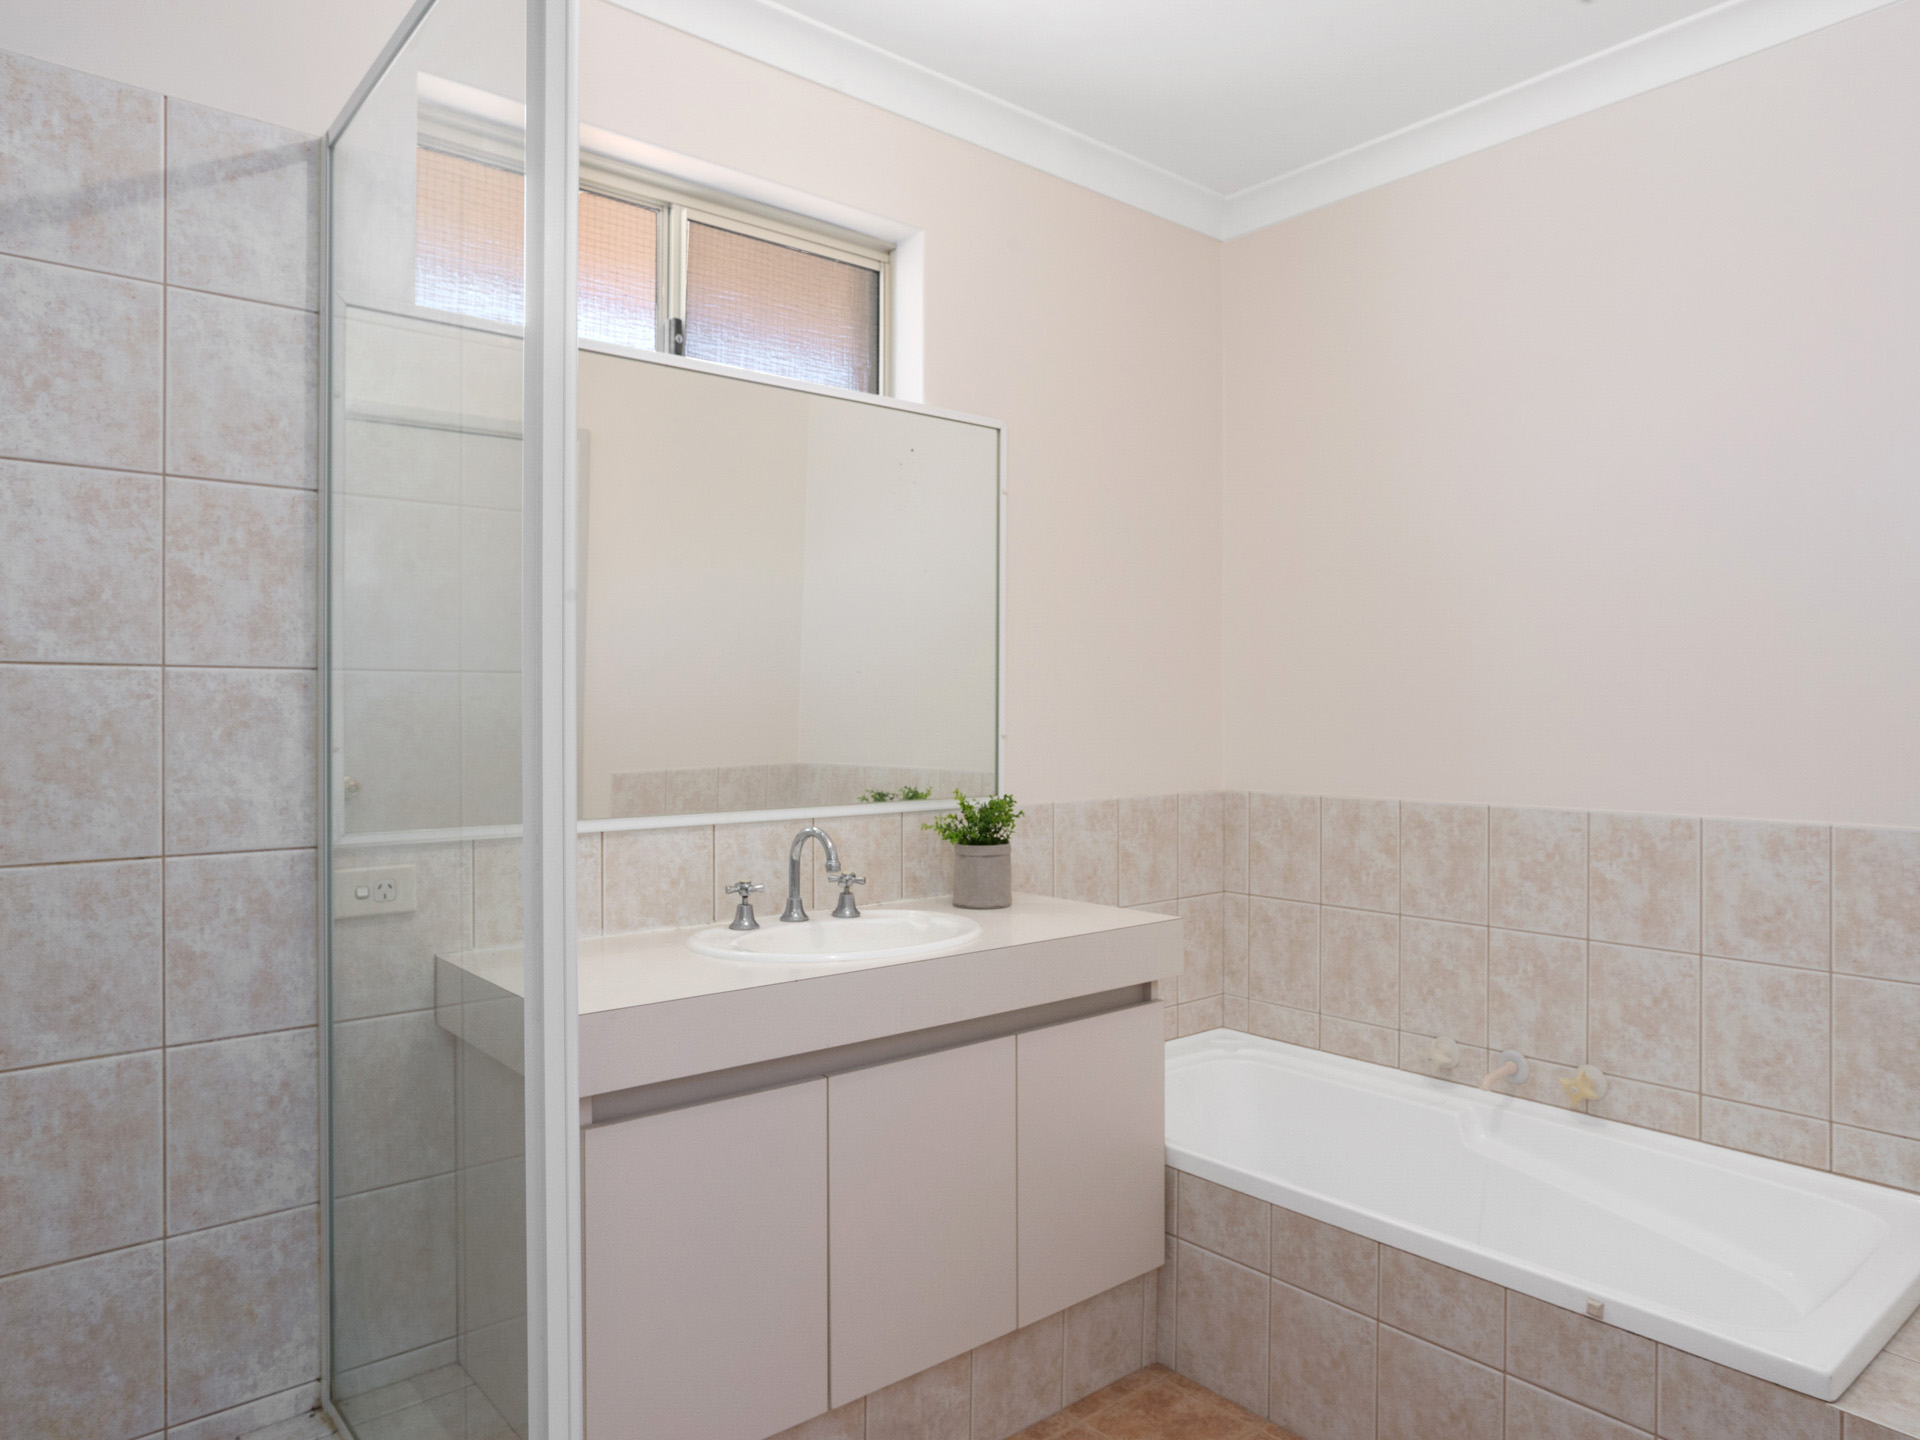 Room 1 2 3 4 5 Duncan Bath